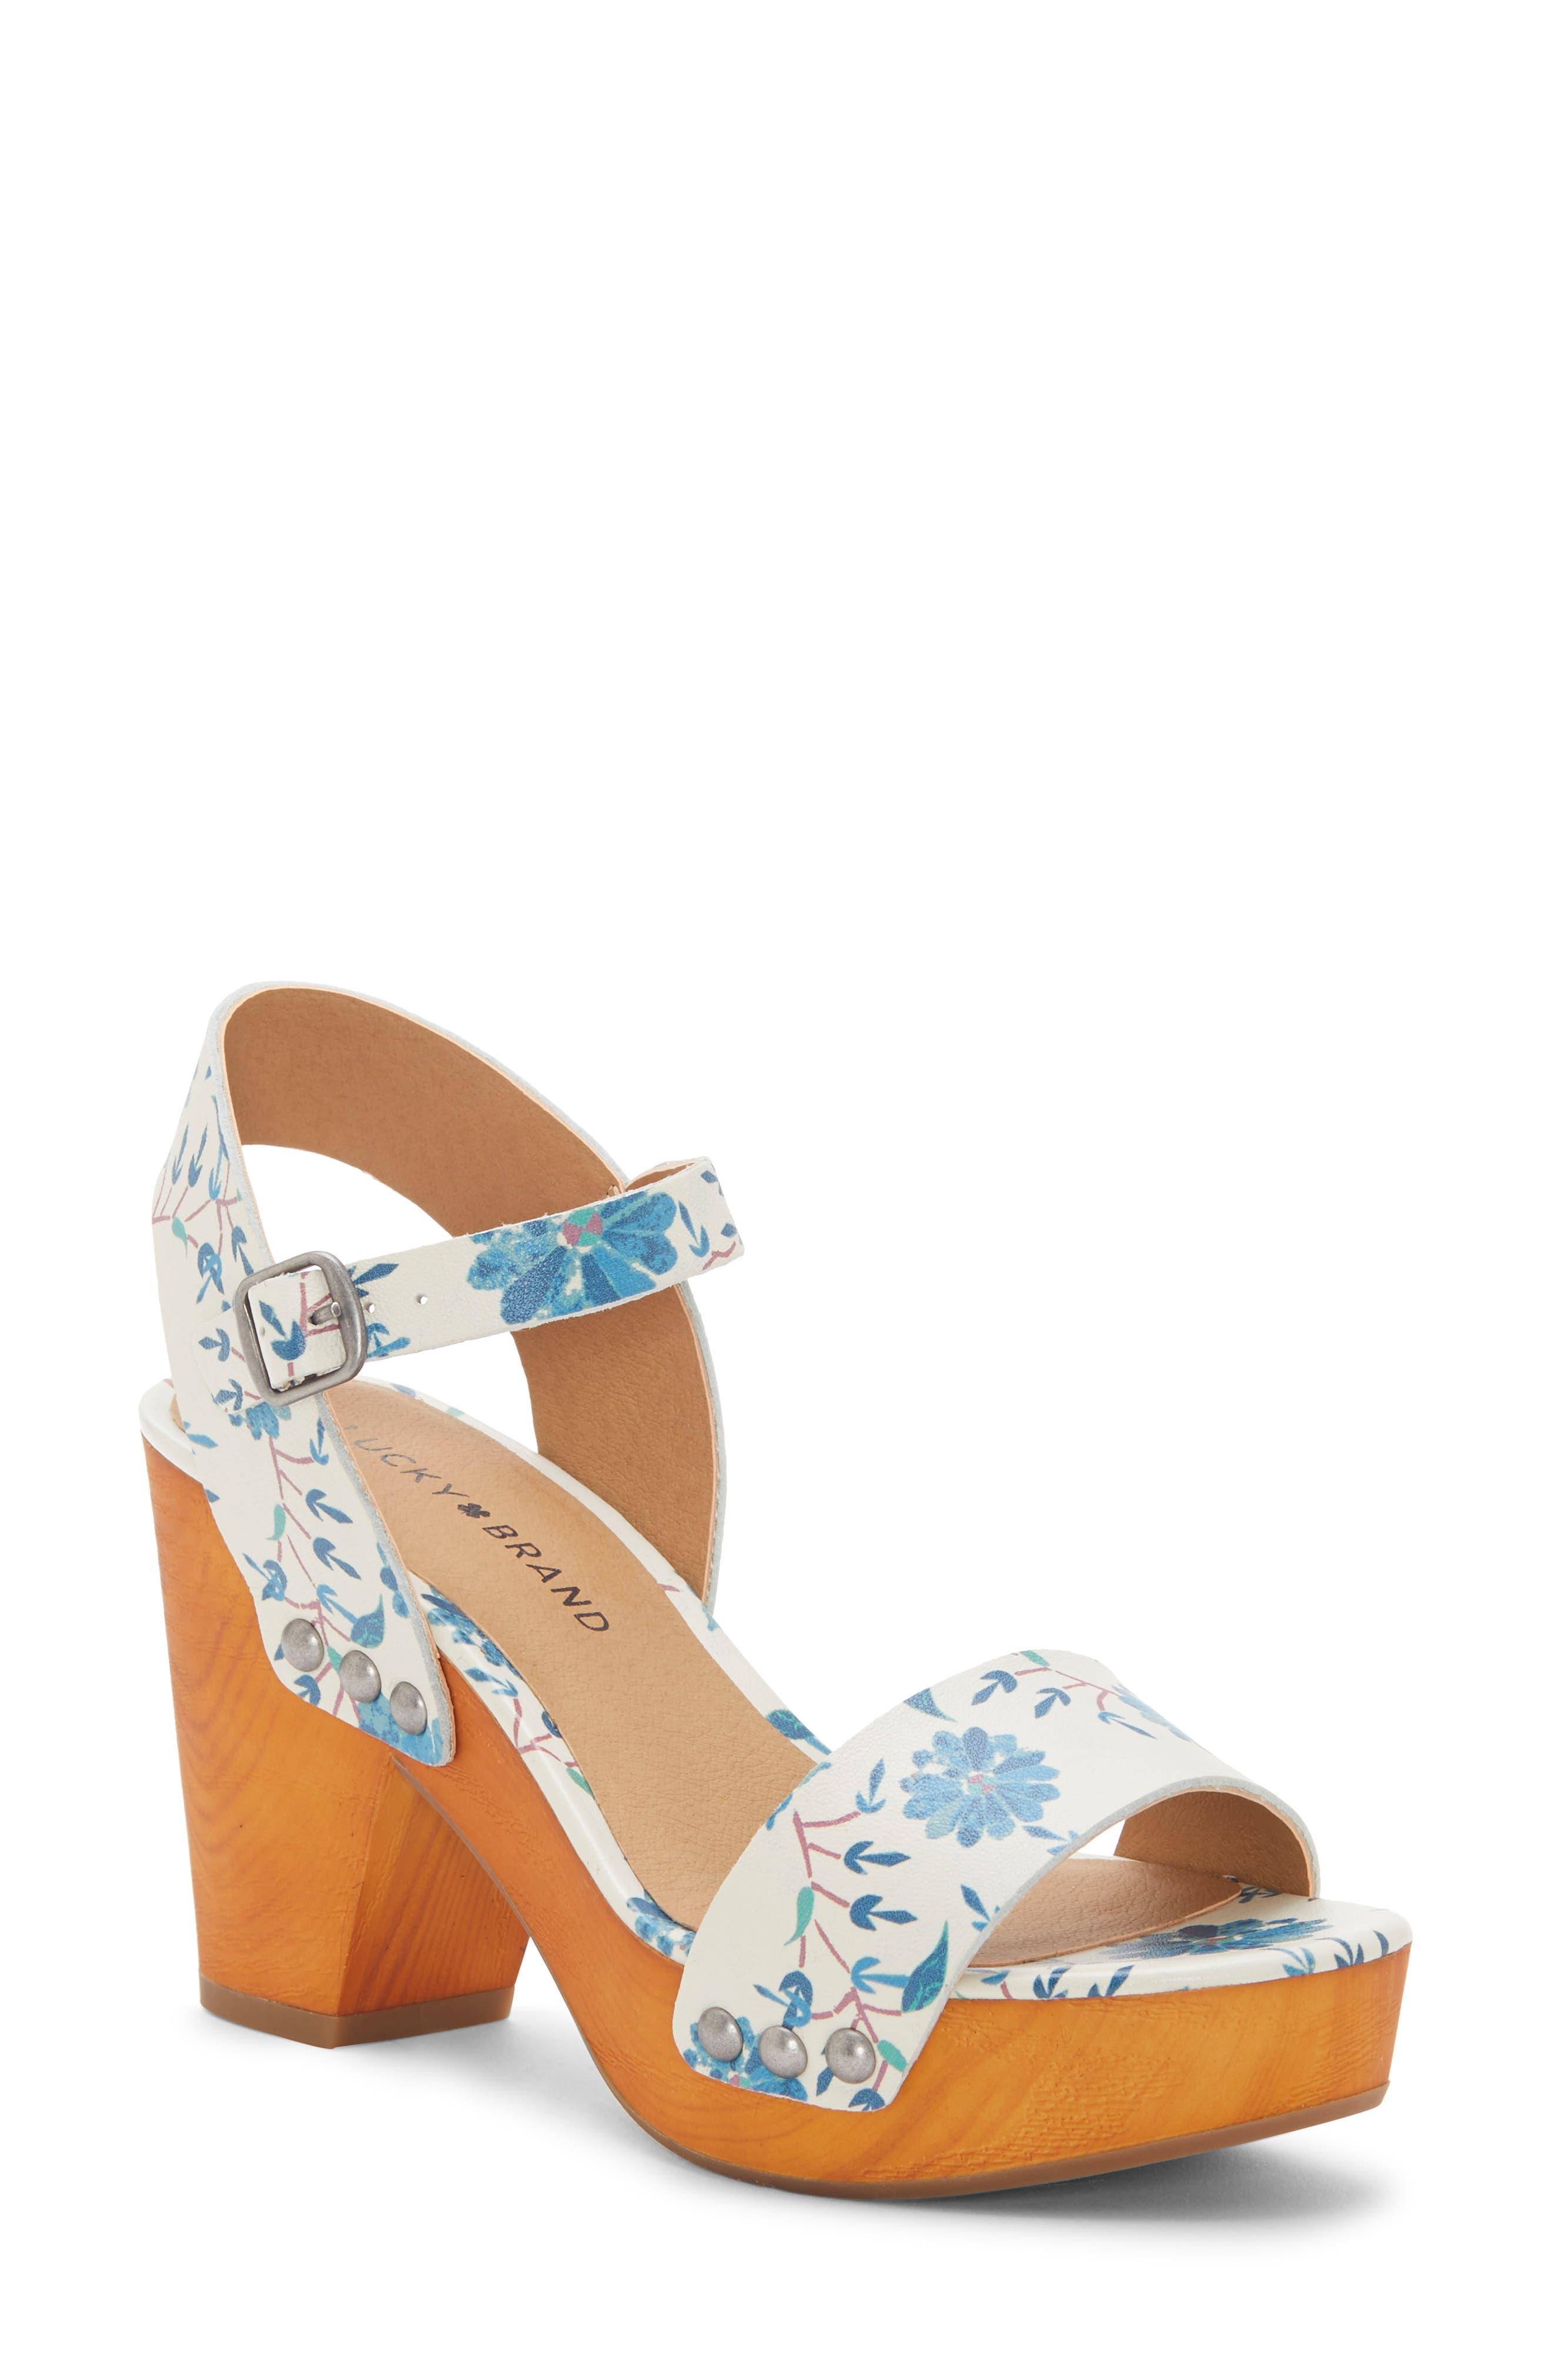 LUCKY BRAND Trisa Platform Sandal, Main, color, BIRCH LEATHER